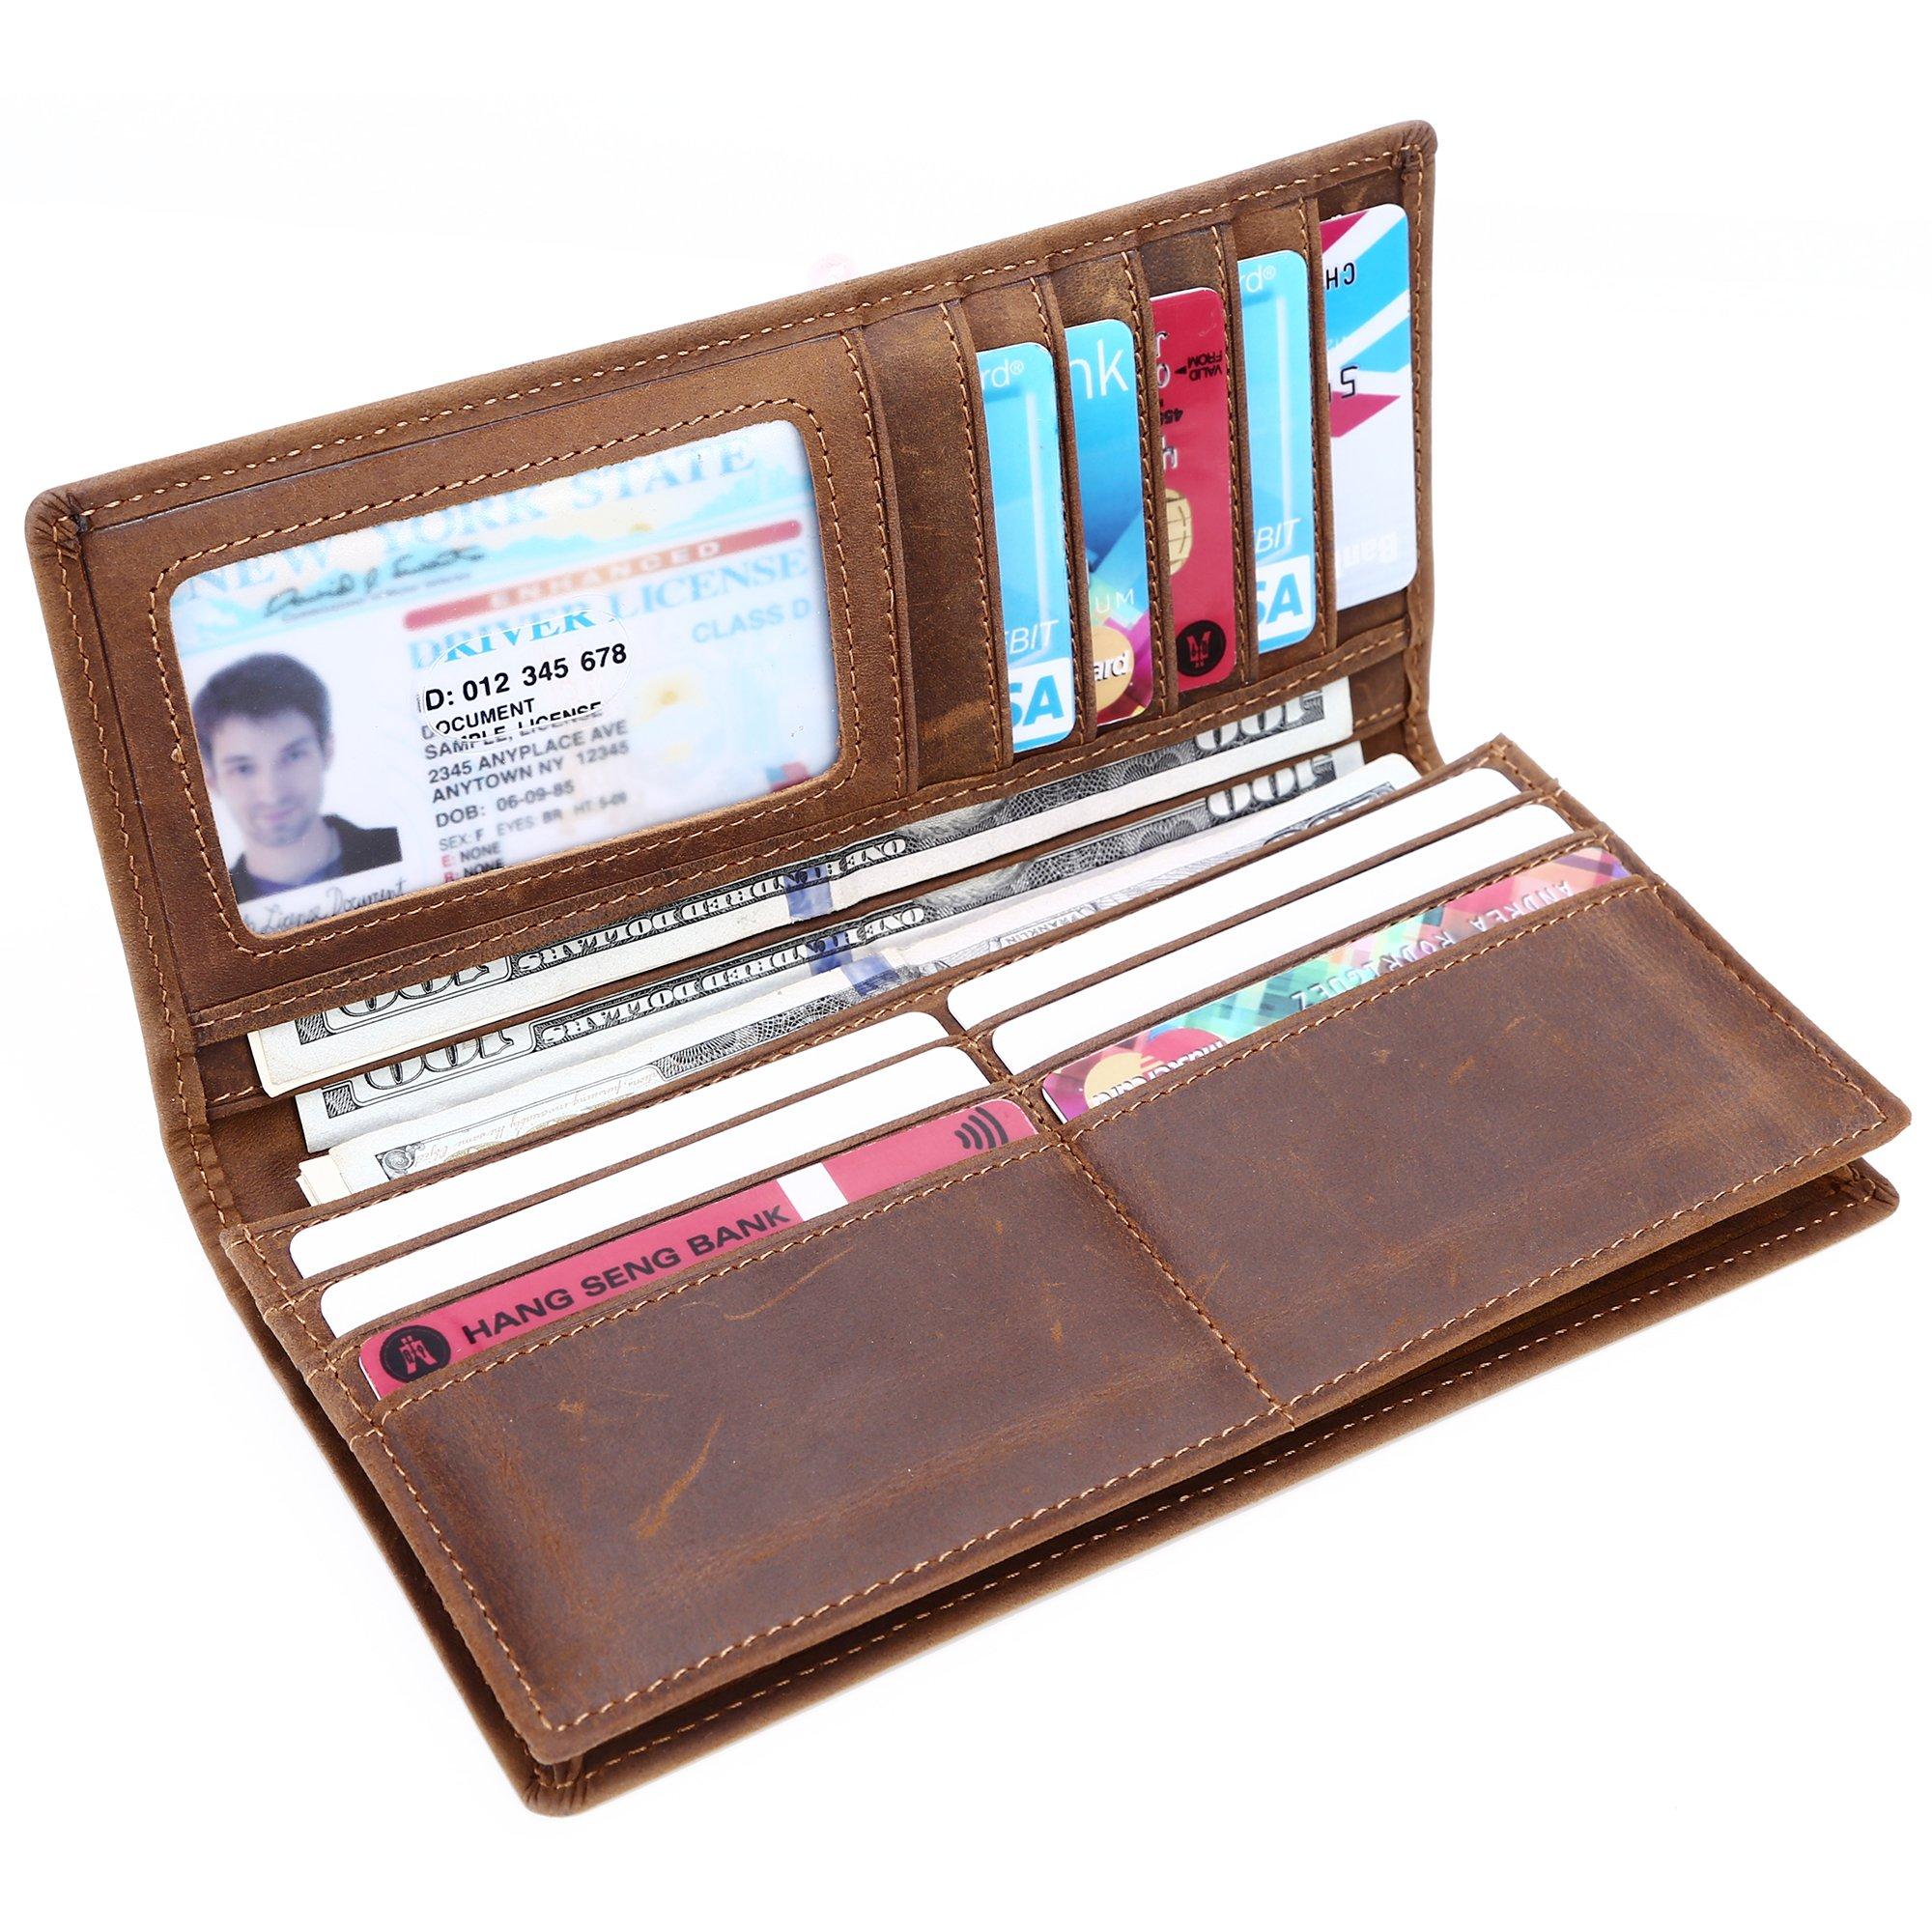 Kinzd Long Wallet Credit Card Holder ID Window Capacity Business Wallet